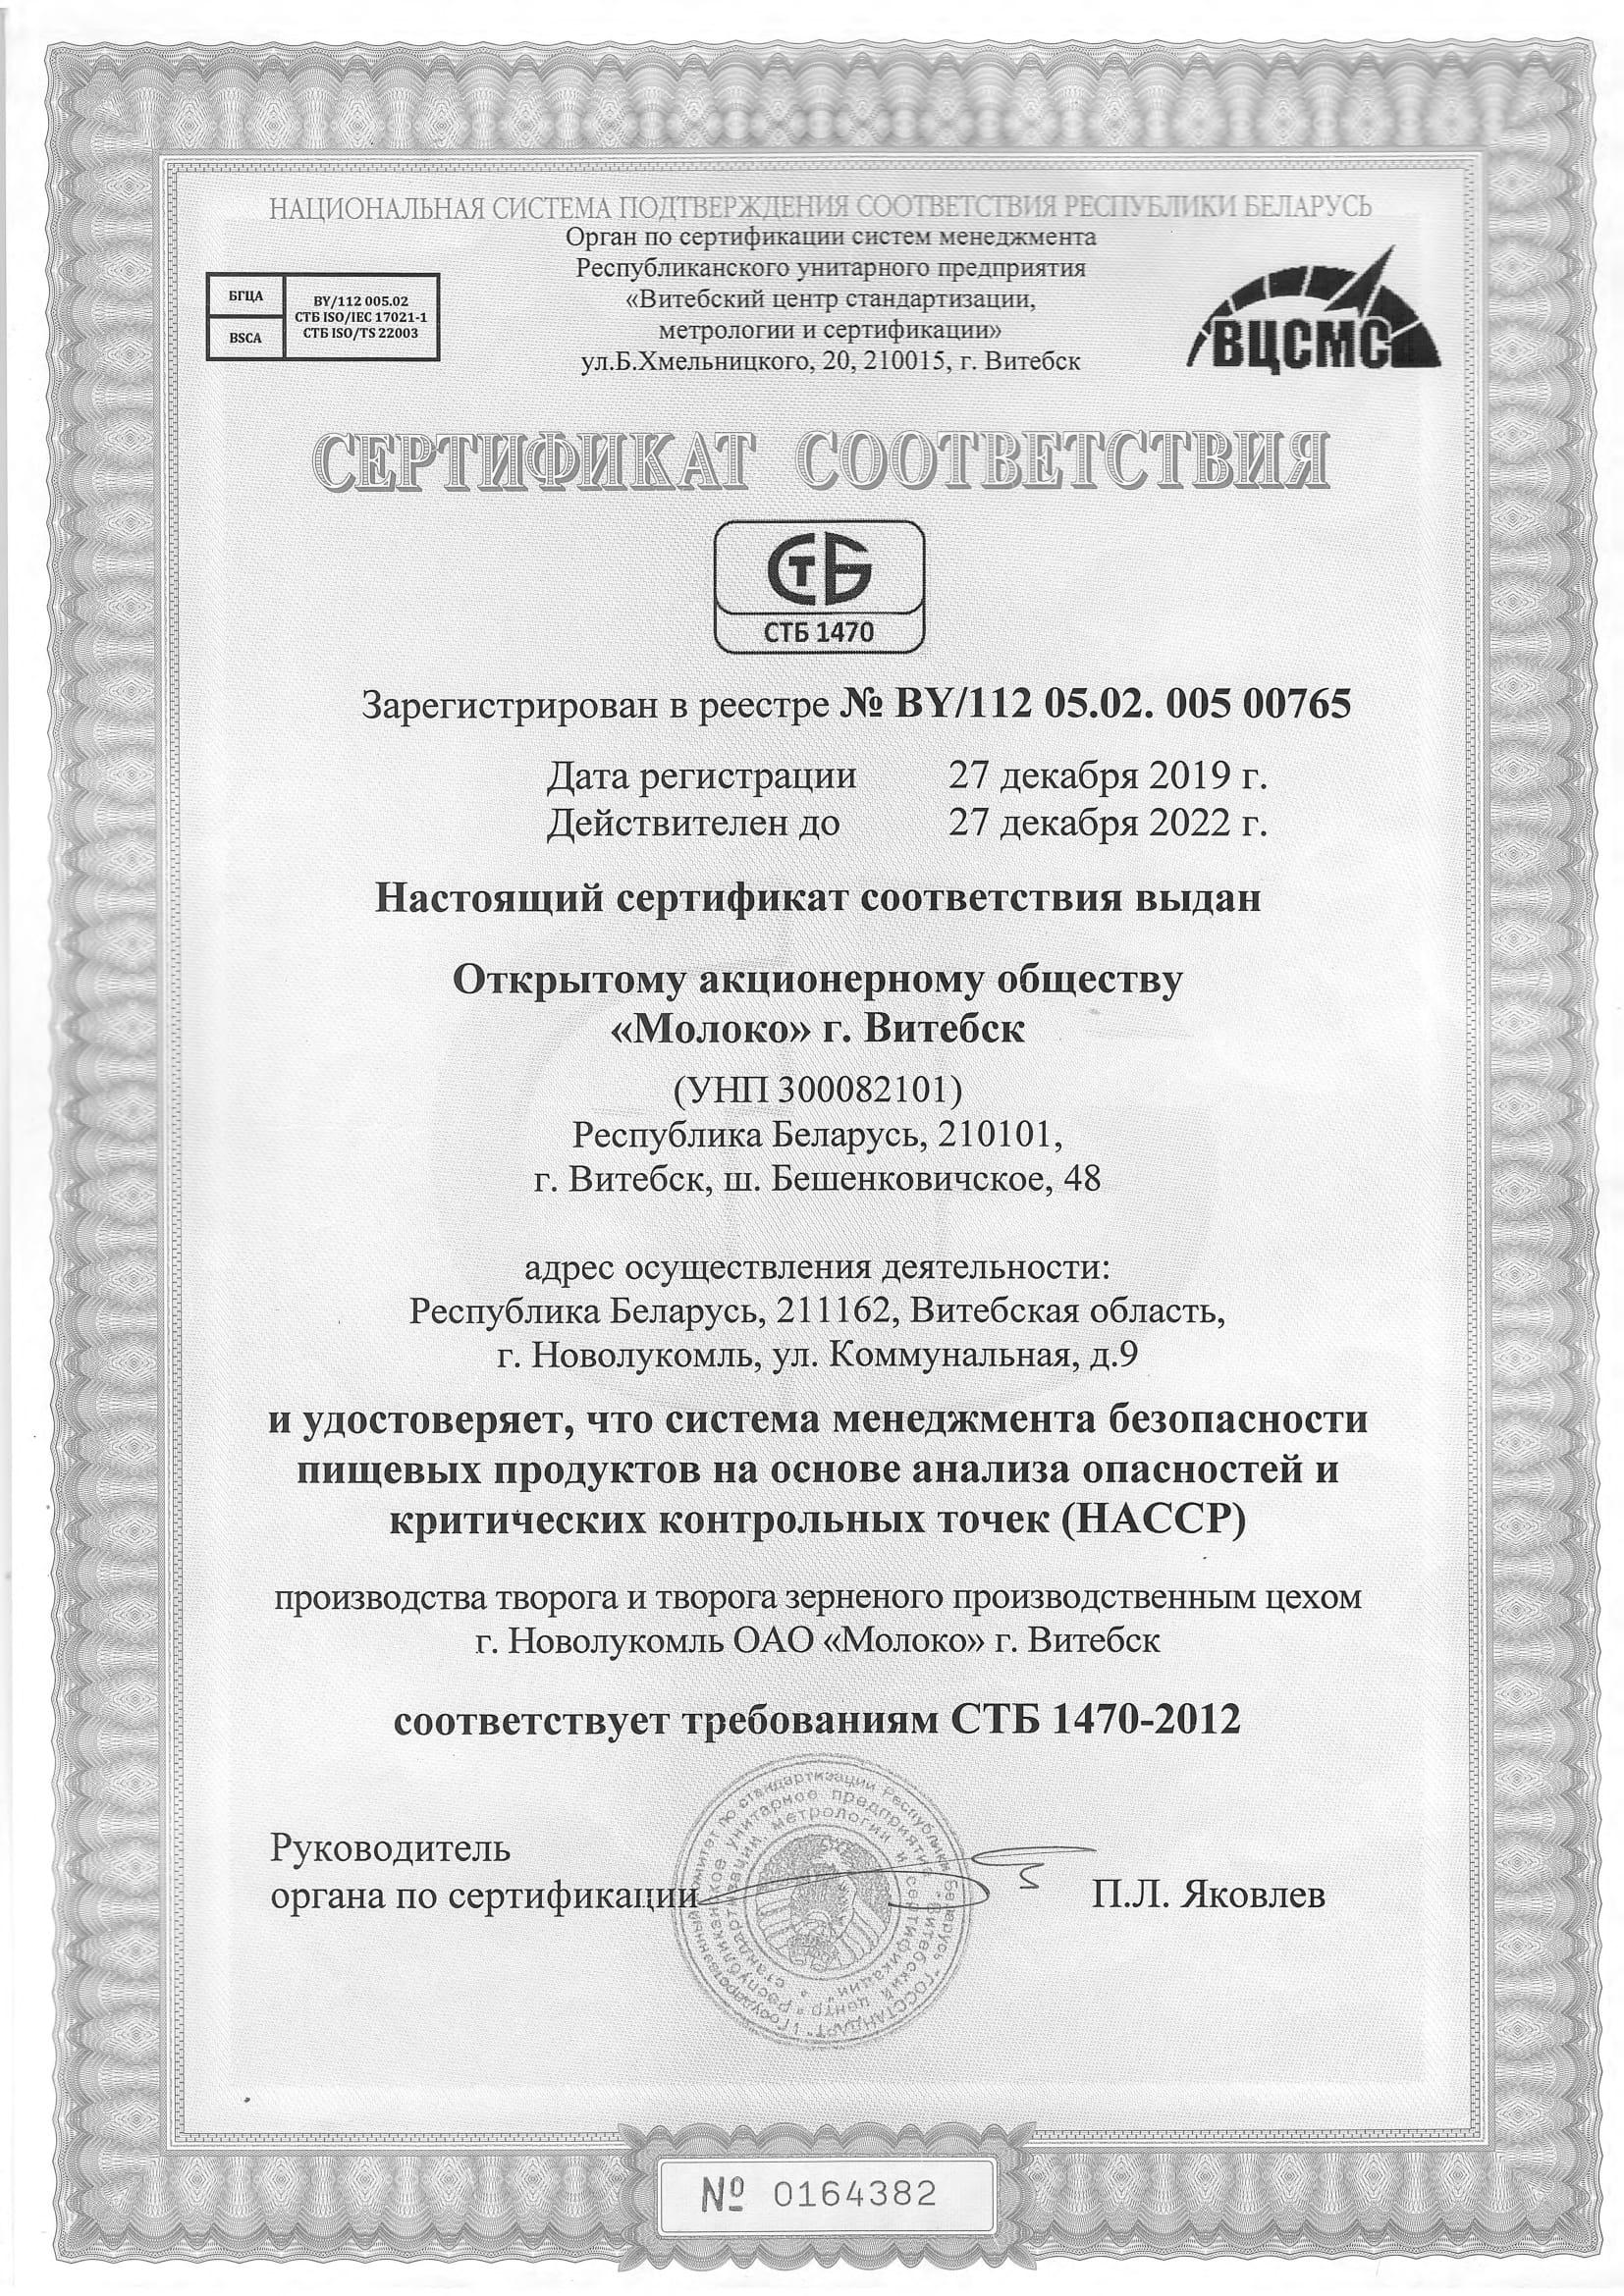 Certificate of conformity STB 1470-2012 (Novolukoml)